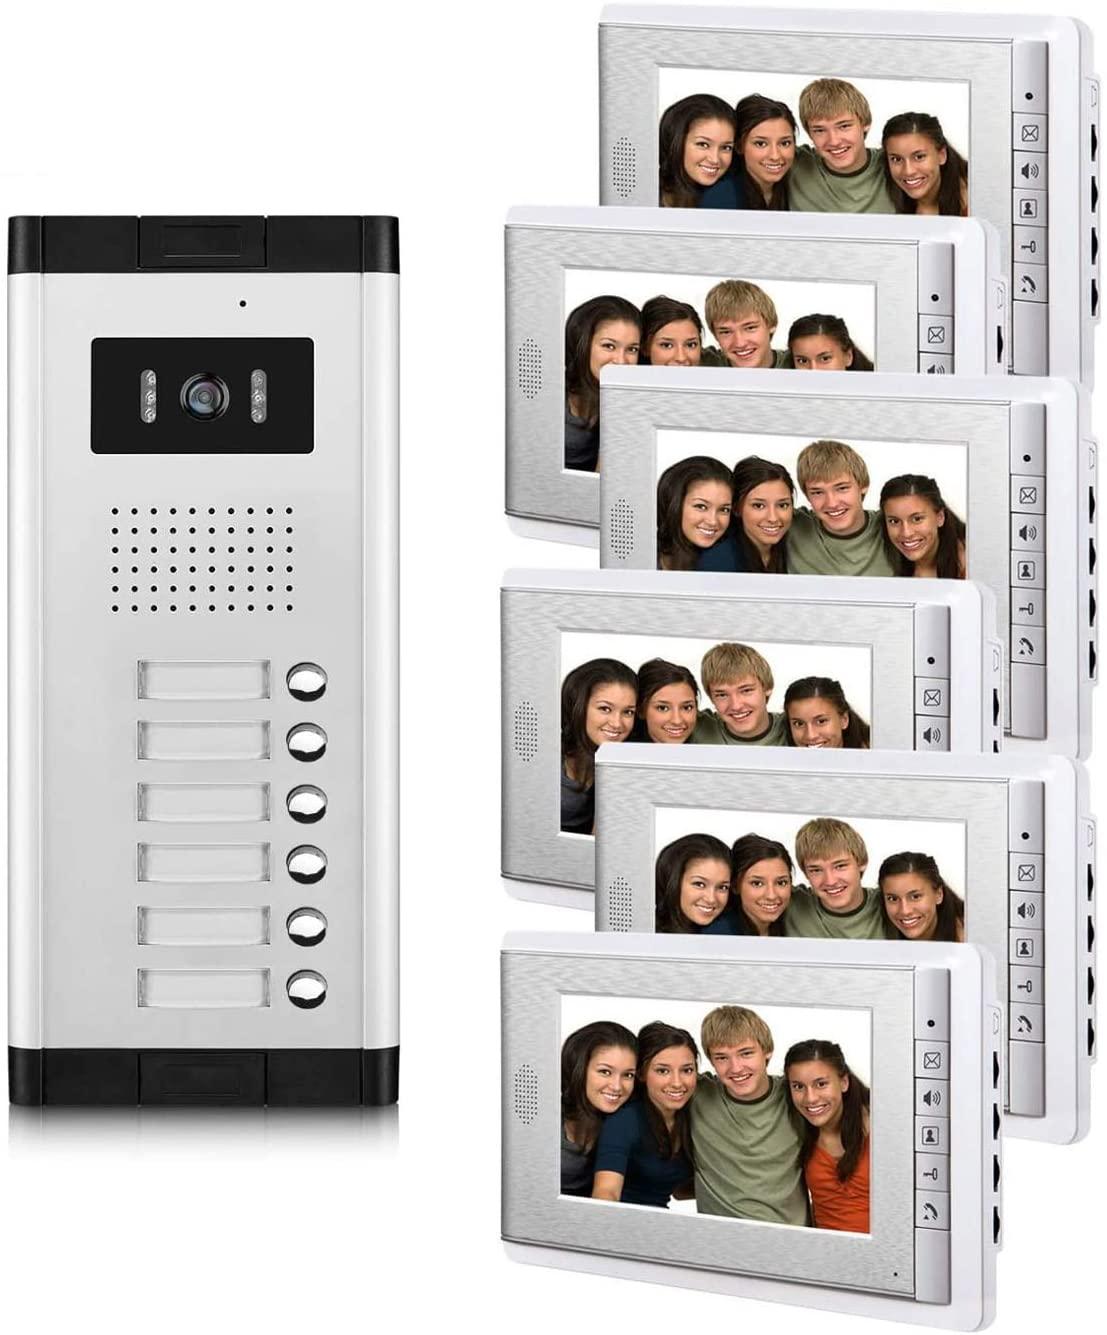 HS-IV-1011 - Amocam Video Portero